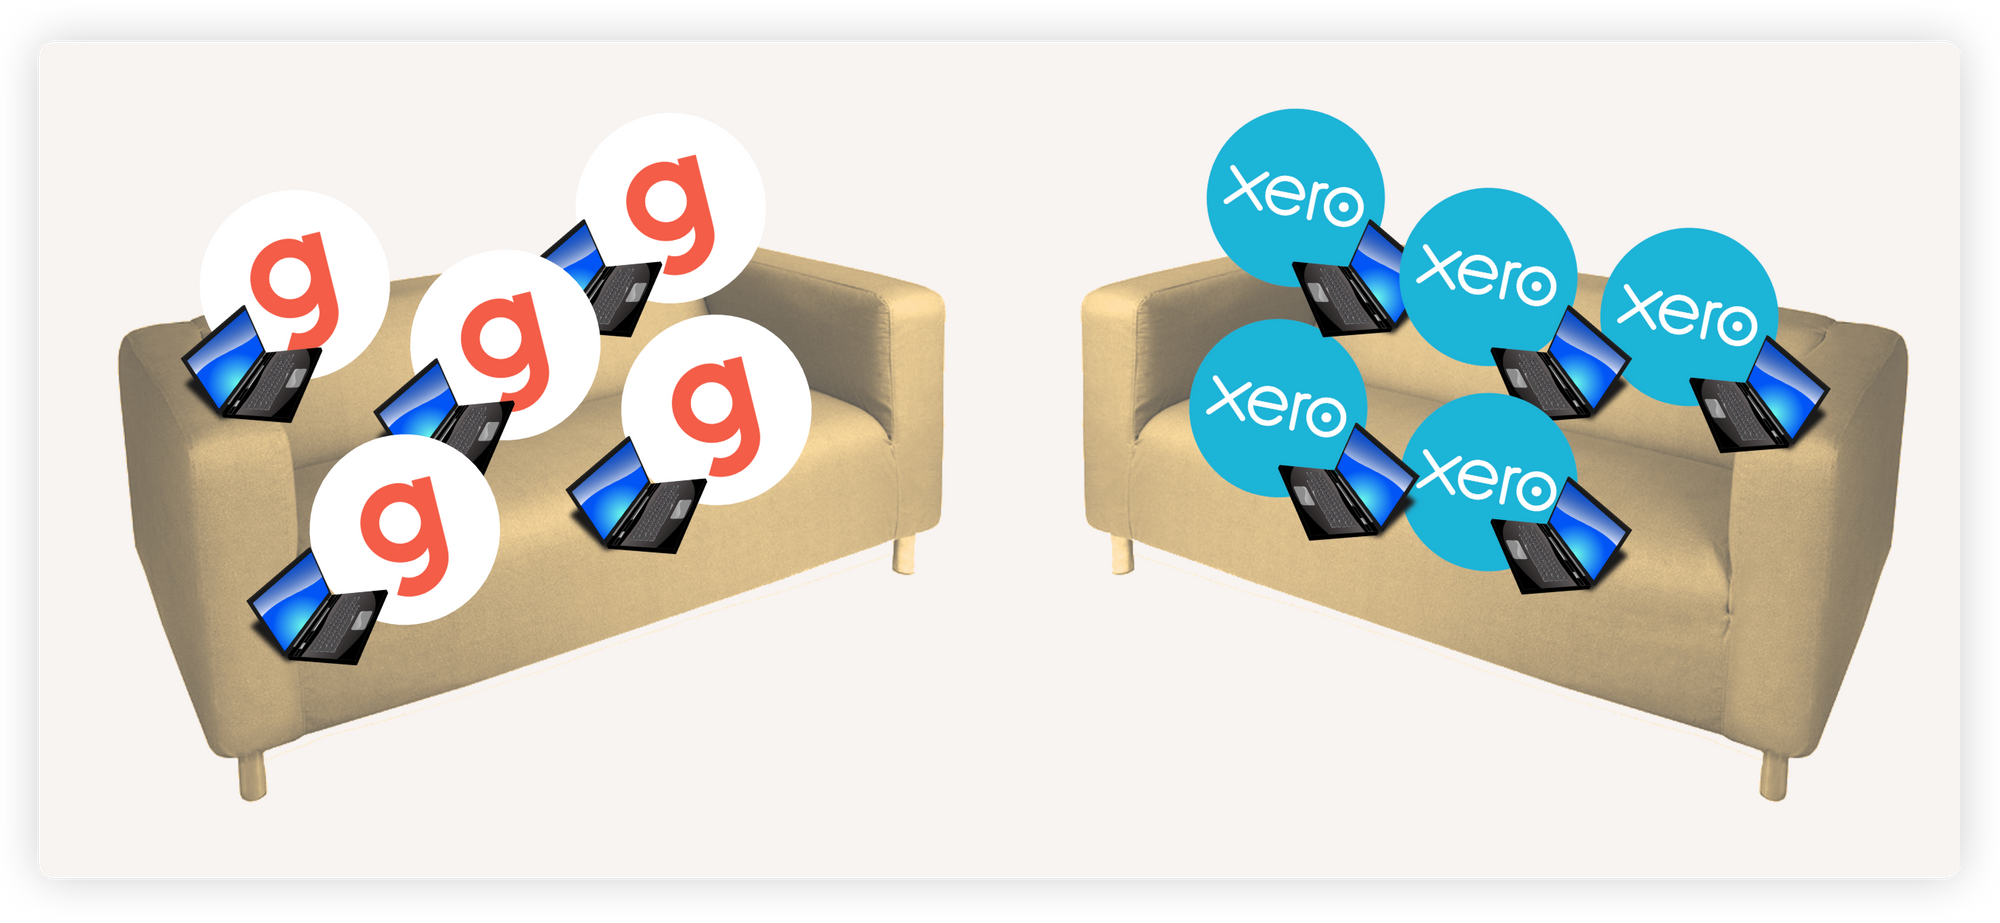 Gusto & Xero: Building a Massive Integration Across Two Companies